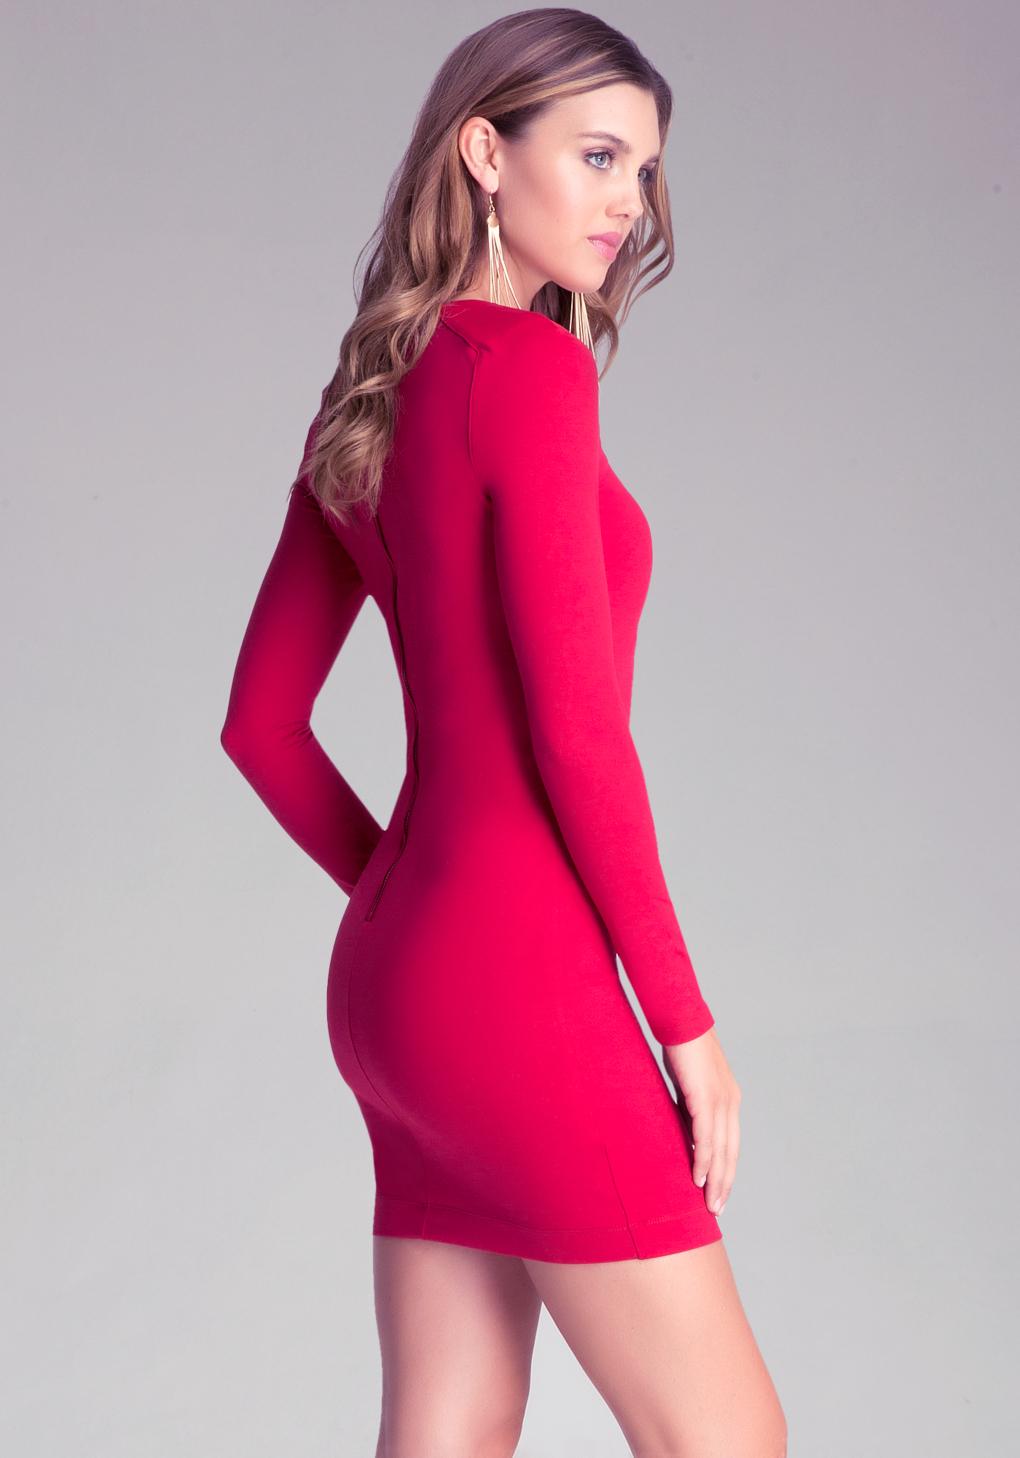 Bebe Long Sleeve Bodycon Dress In Red Lyst